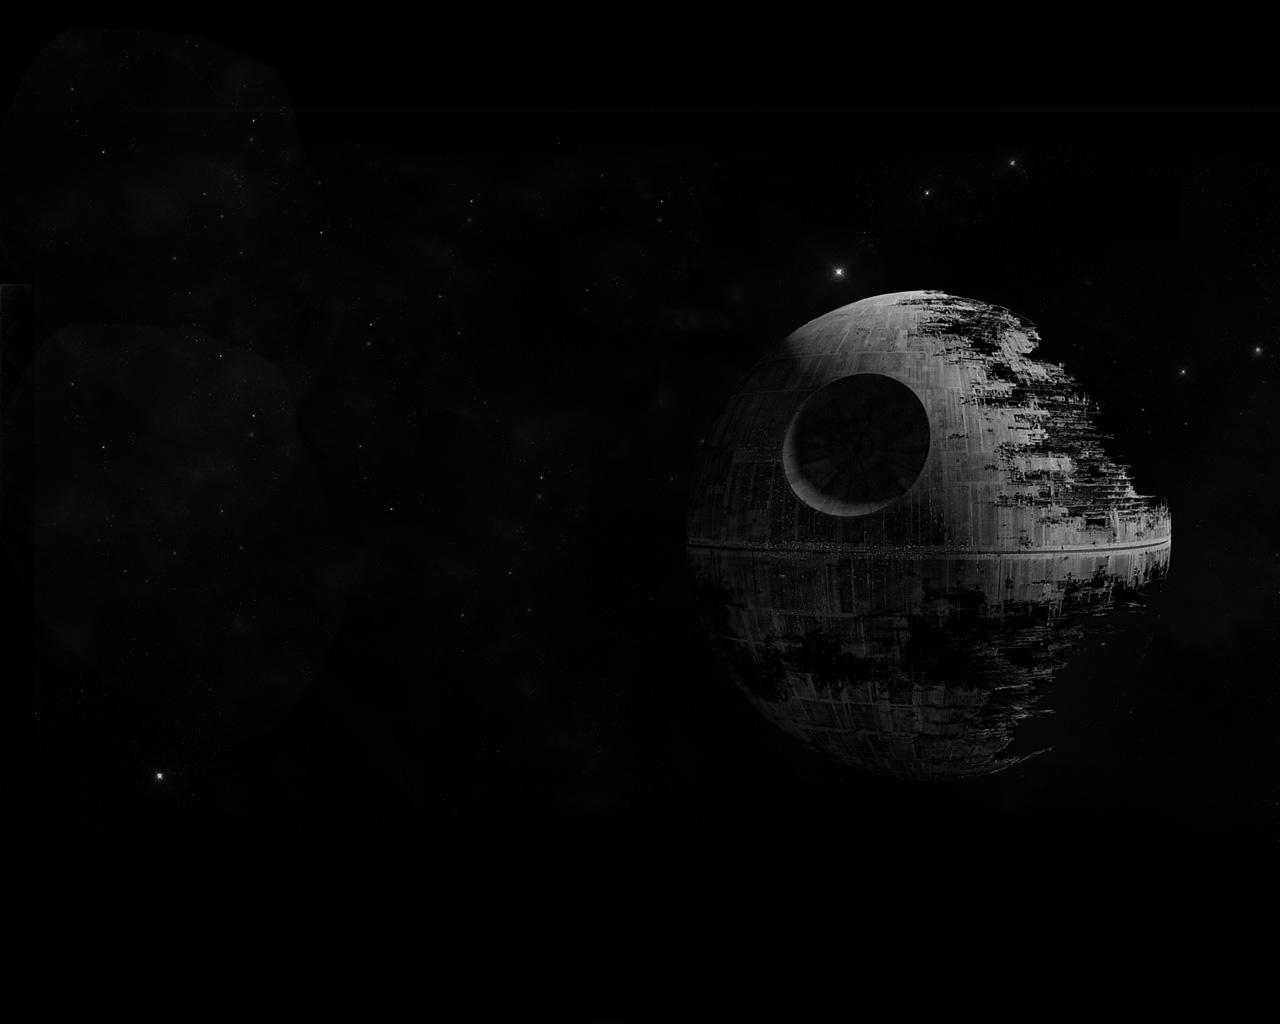 Star Wars Wallpaper 19jpg 1280x1024